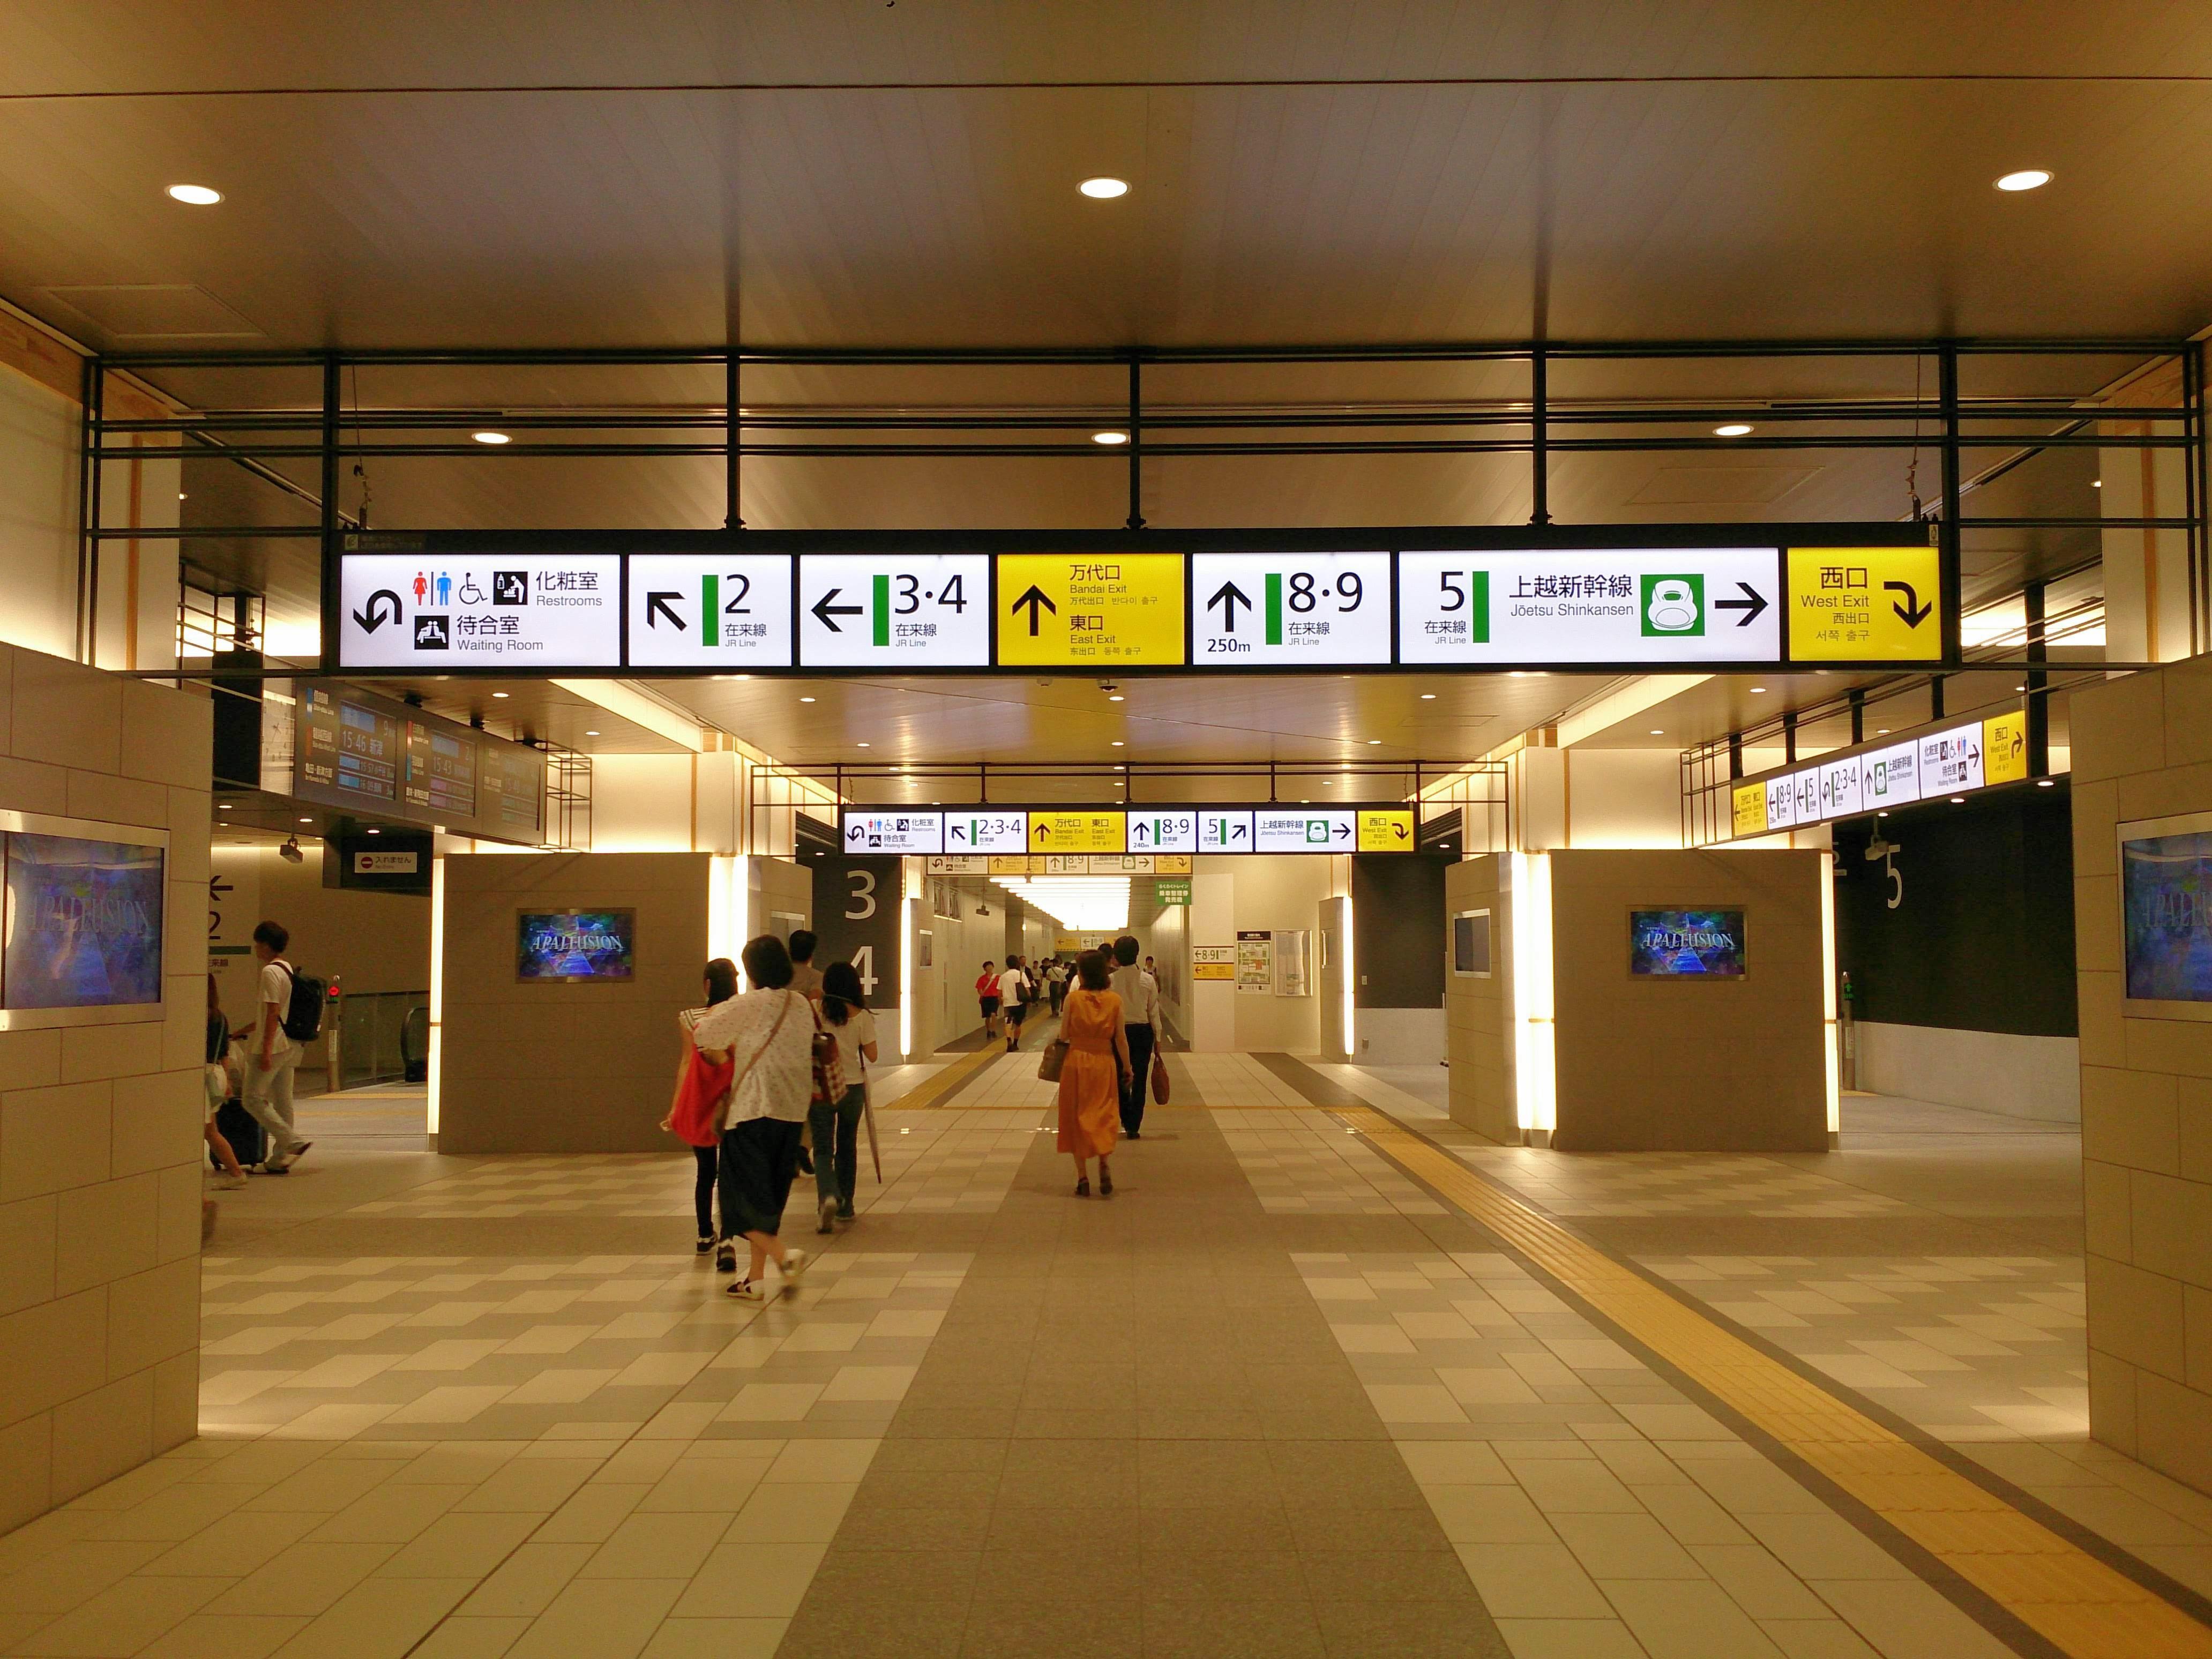 https://upload.wikimedia.org/wikipedia/commons/0/01/Niigata_Station_Kouka_Zairai_Kounai2.jpg